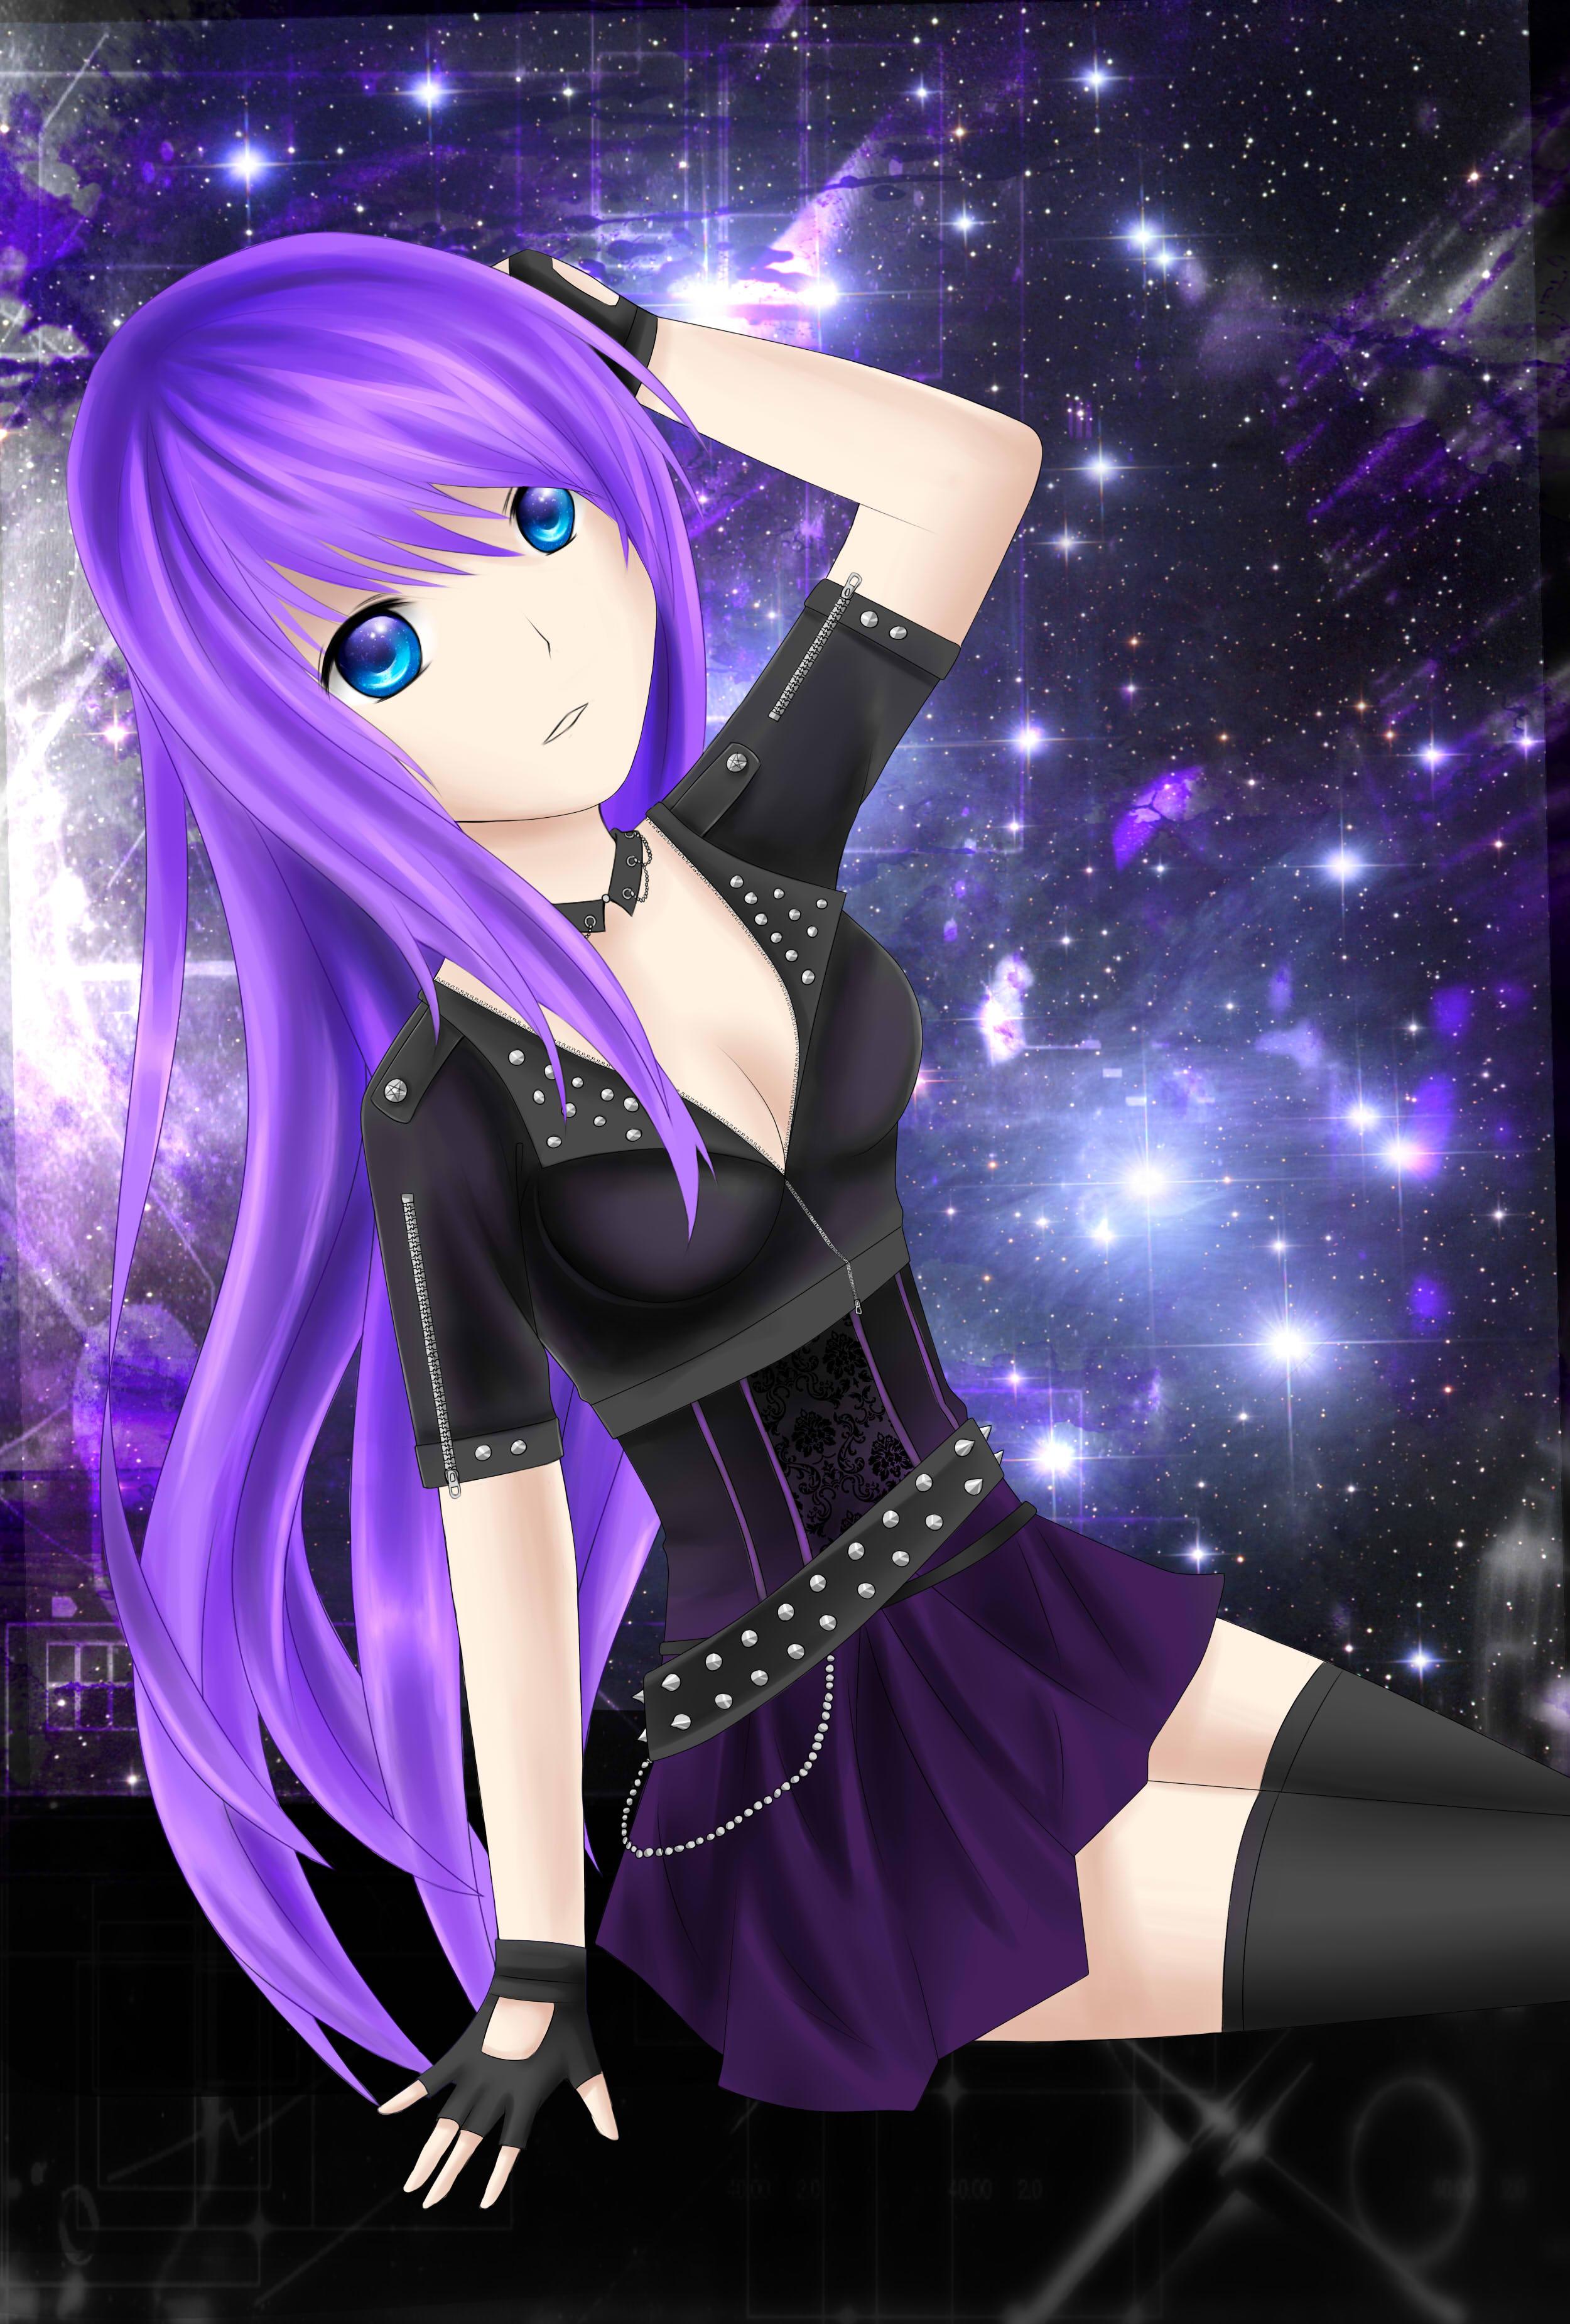 Purple Galaxy Anime Girl Wallpaper